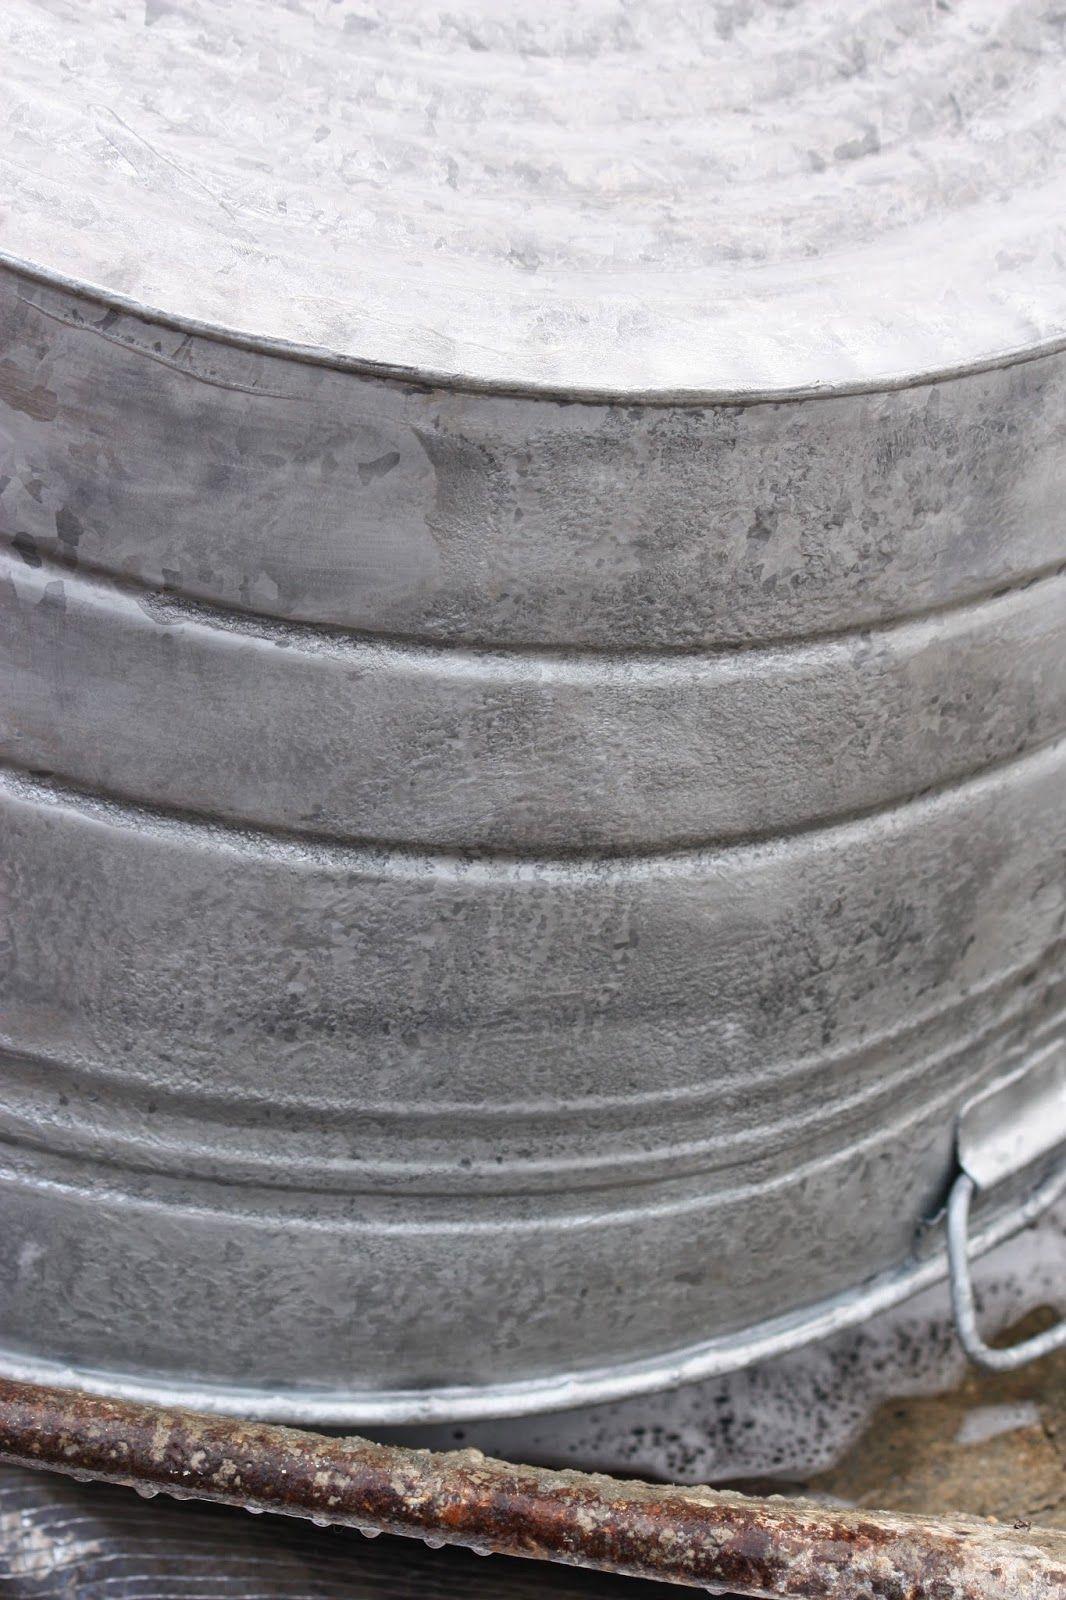 How To Age Galvanized Metal Galvanized Metal Galvanized